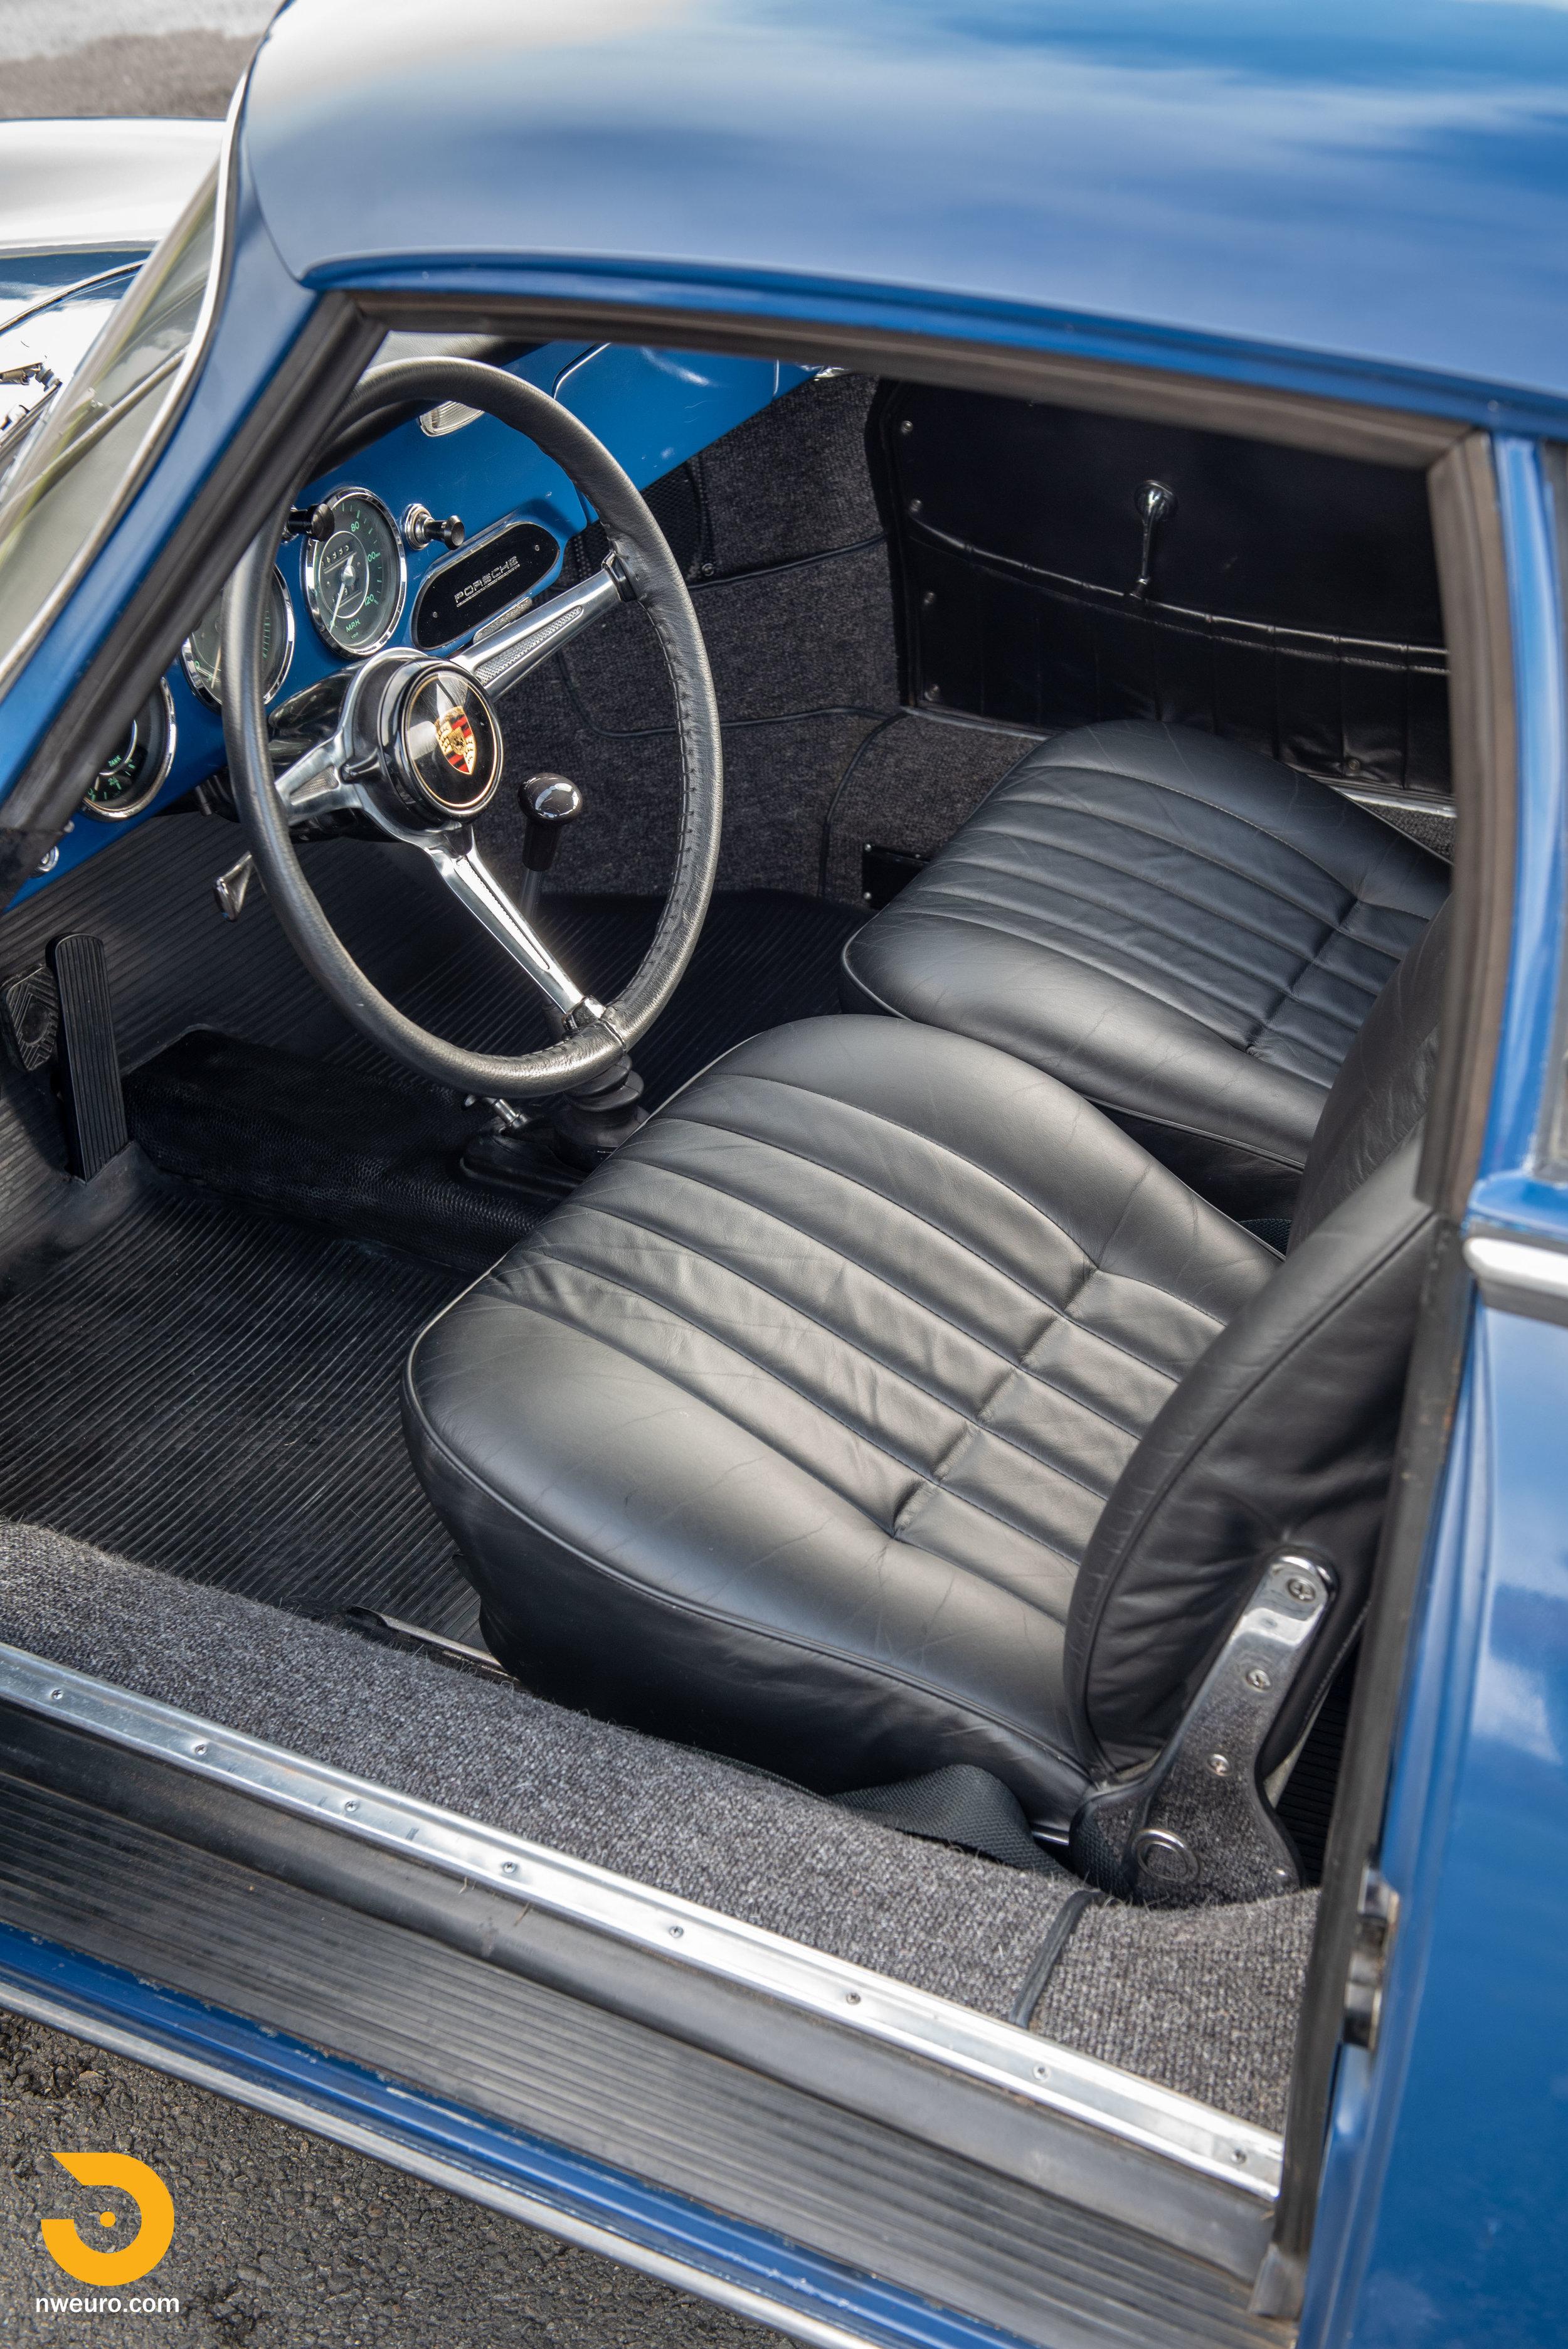 1960 Porsche 356 Hardtop Cab 1600 Super-99.jpg